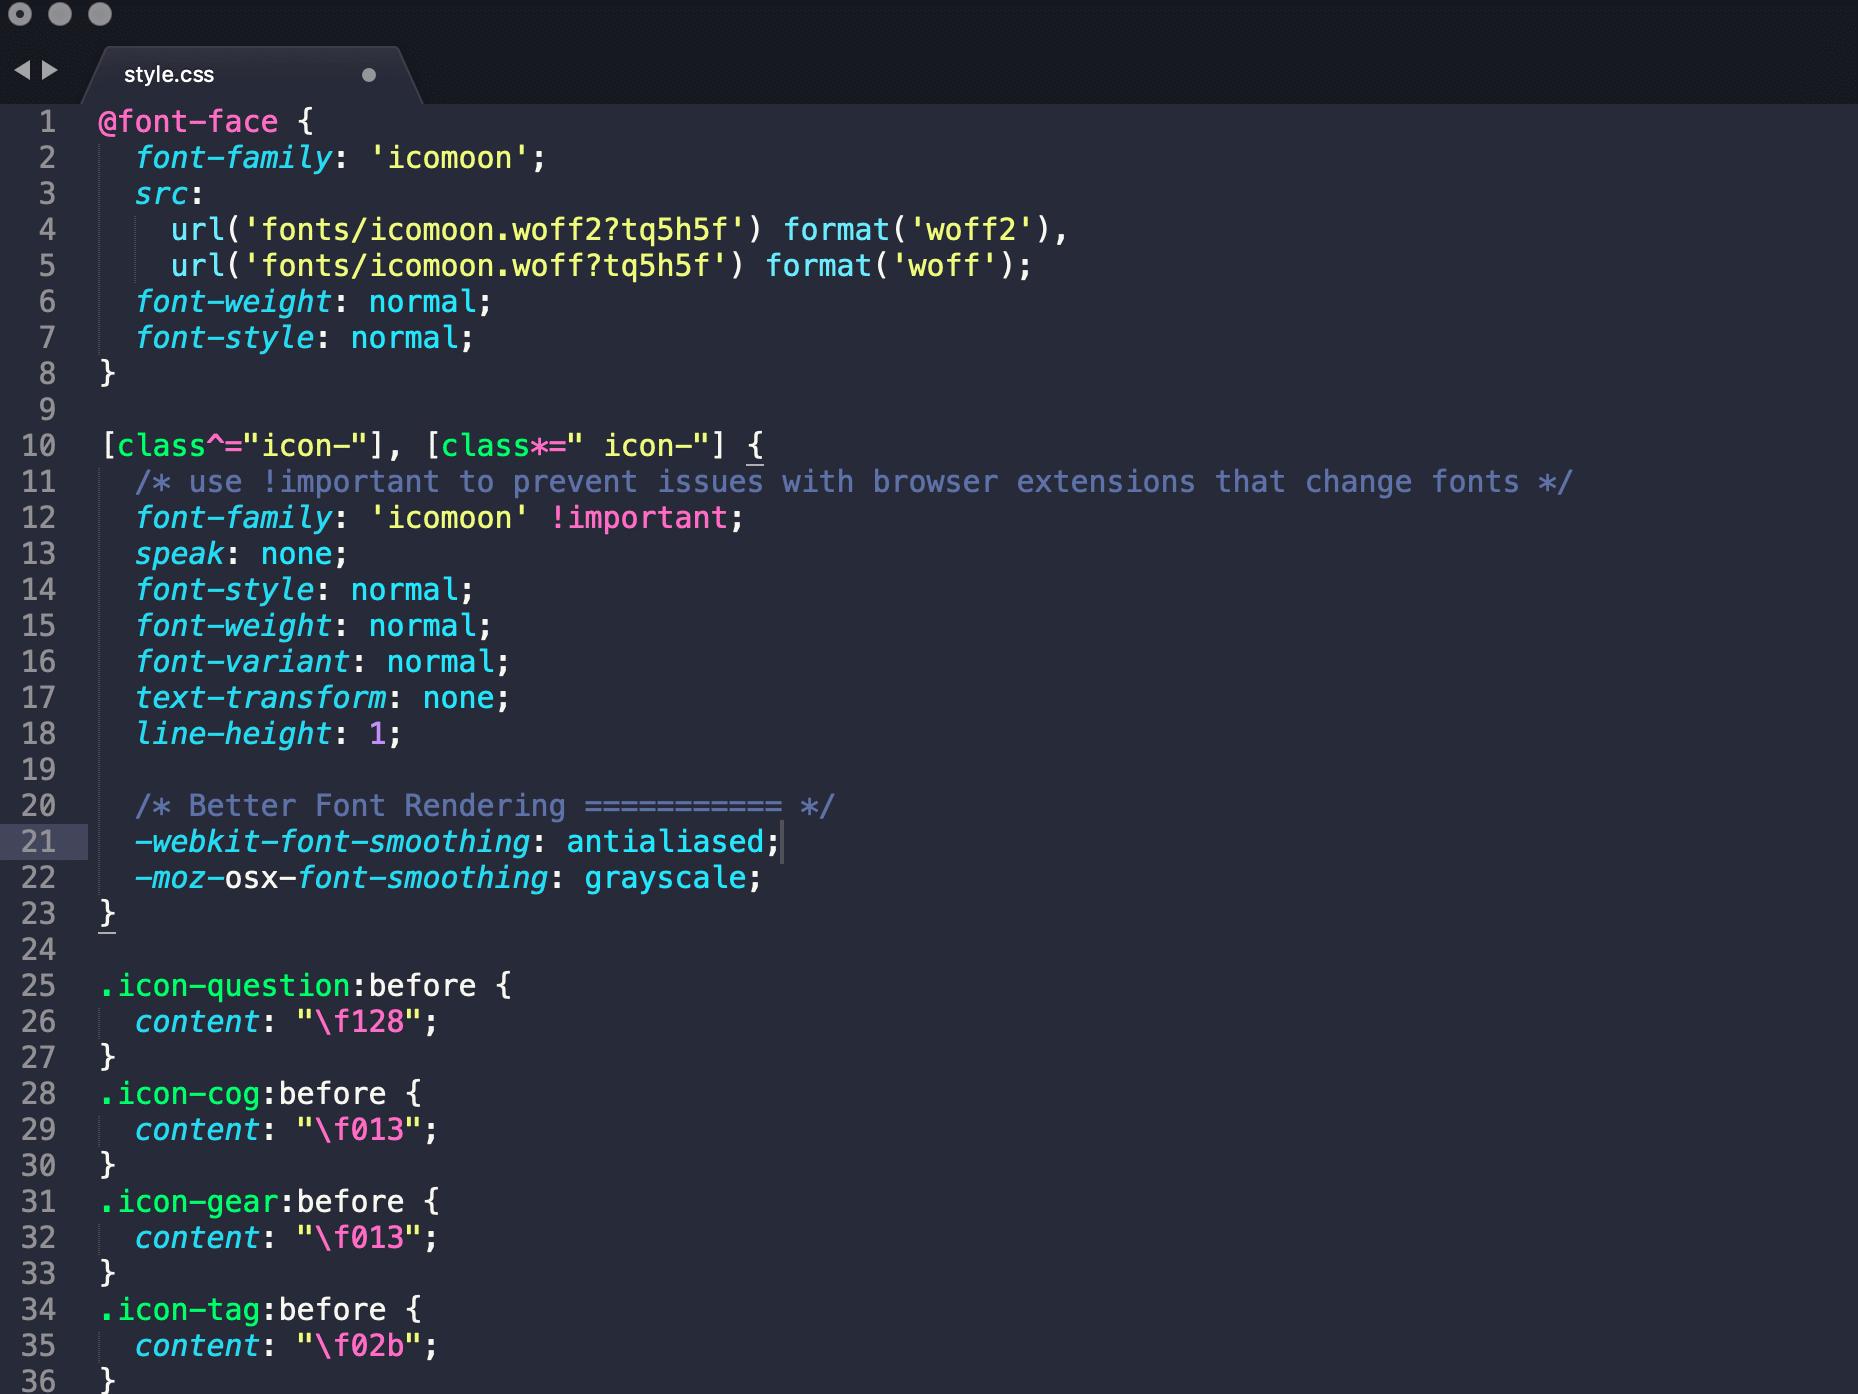 Archivo de IcoMoon CSS